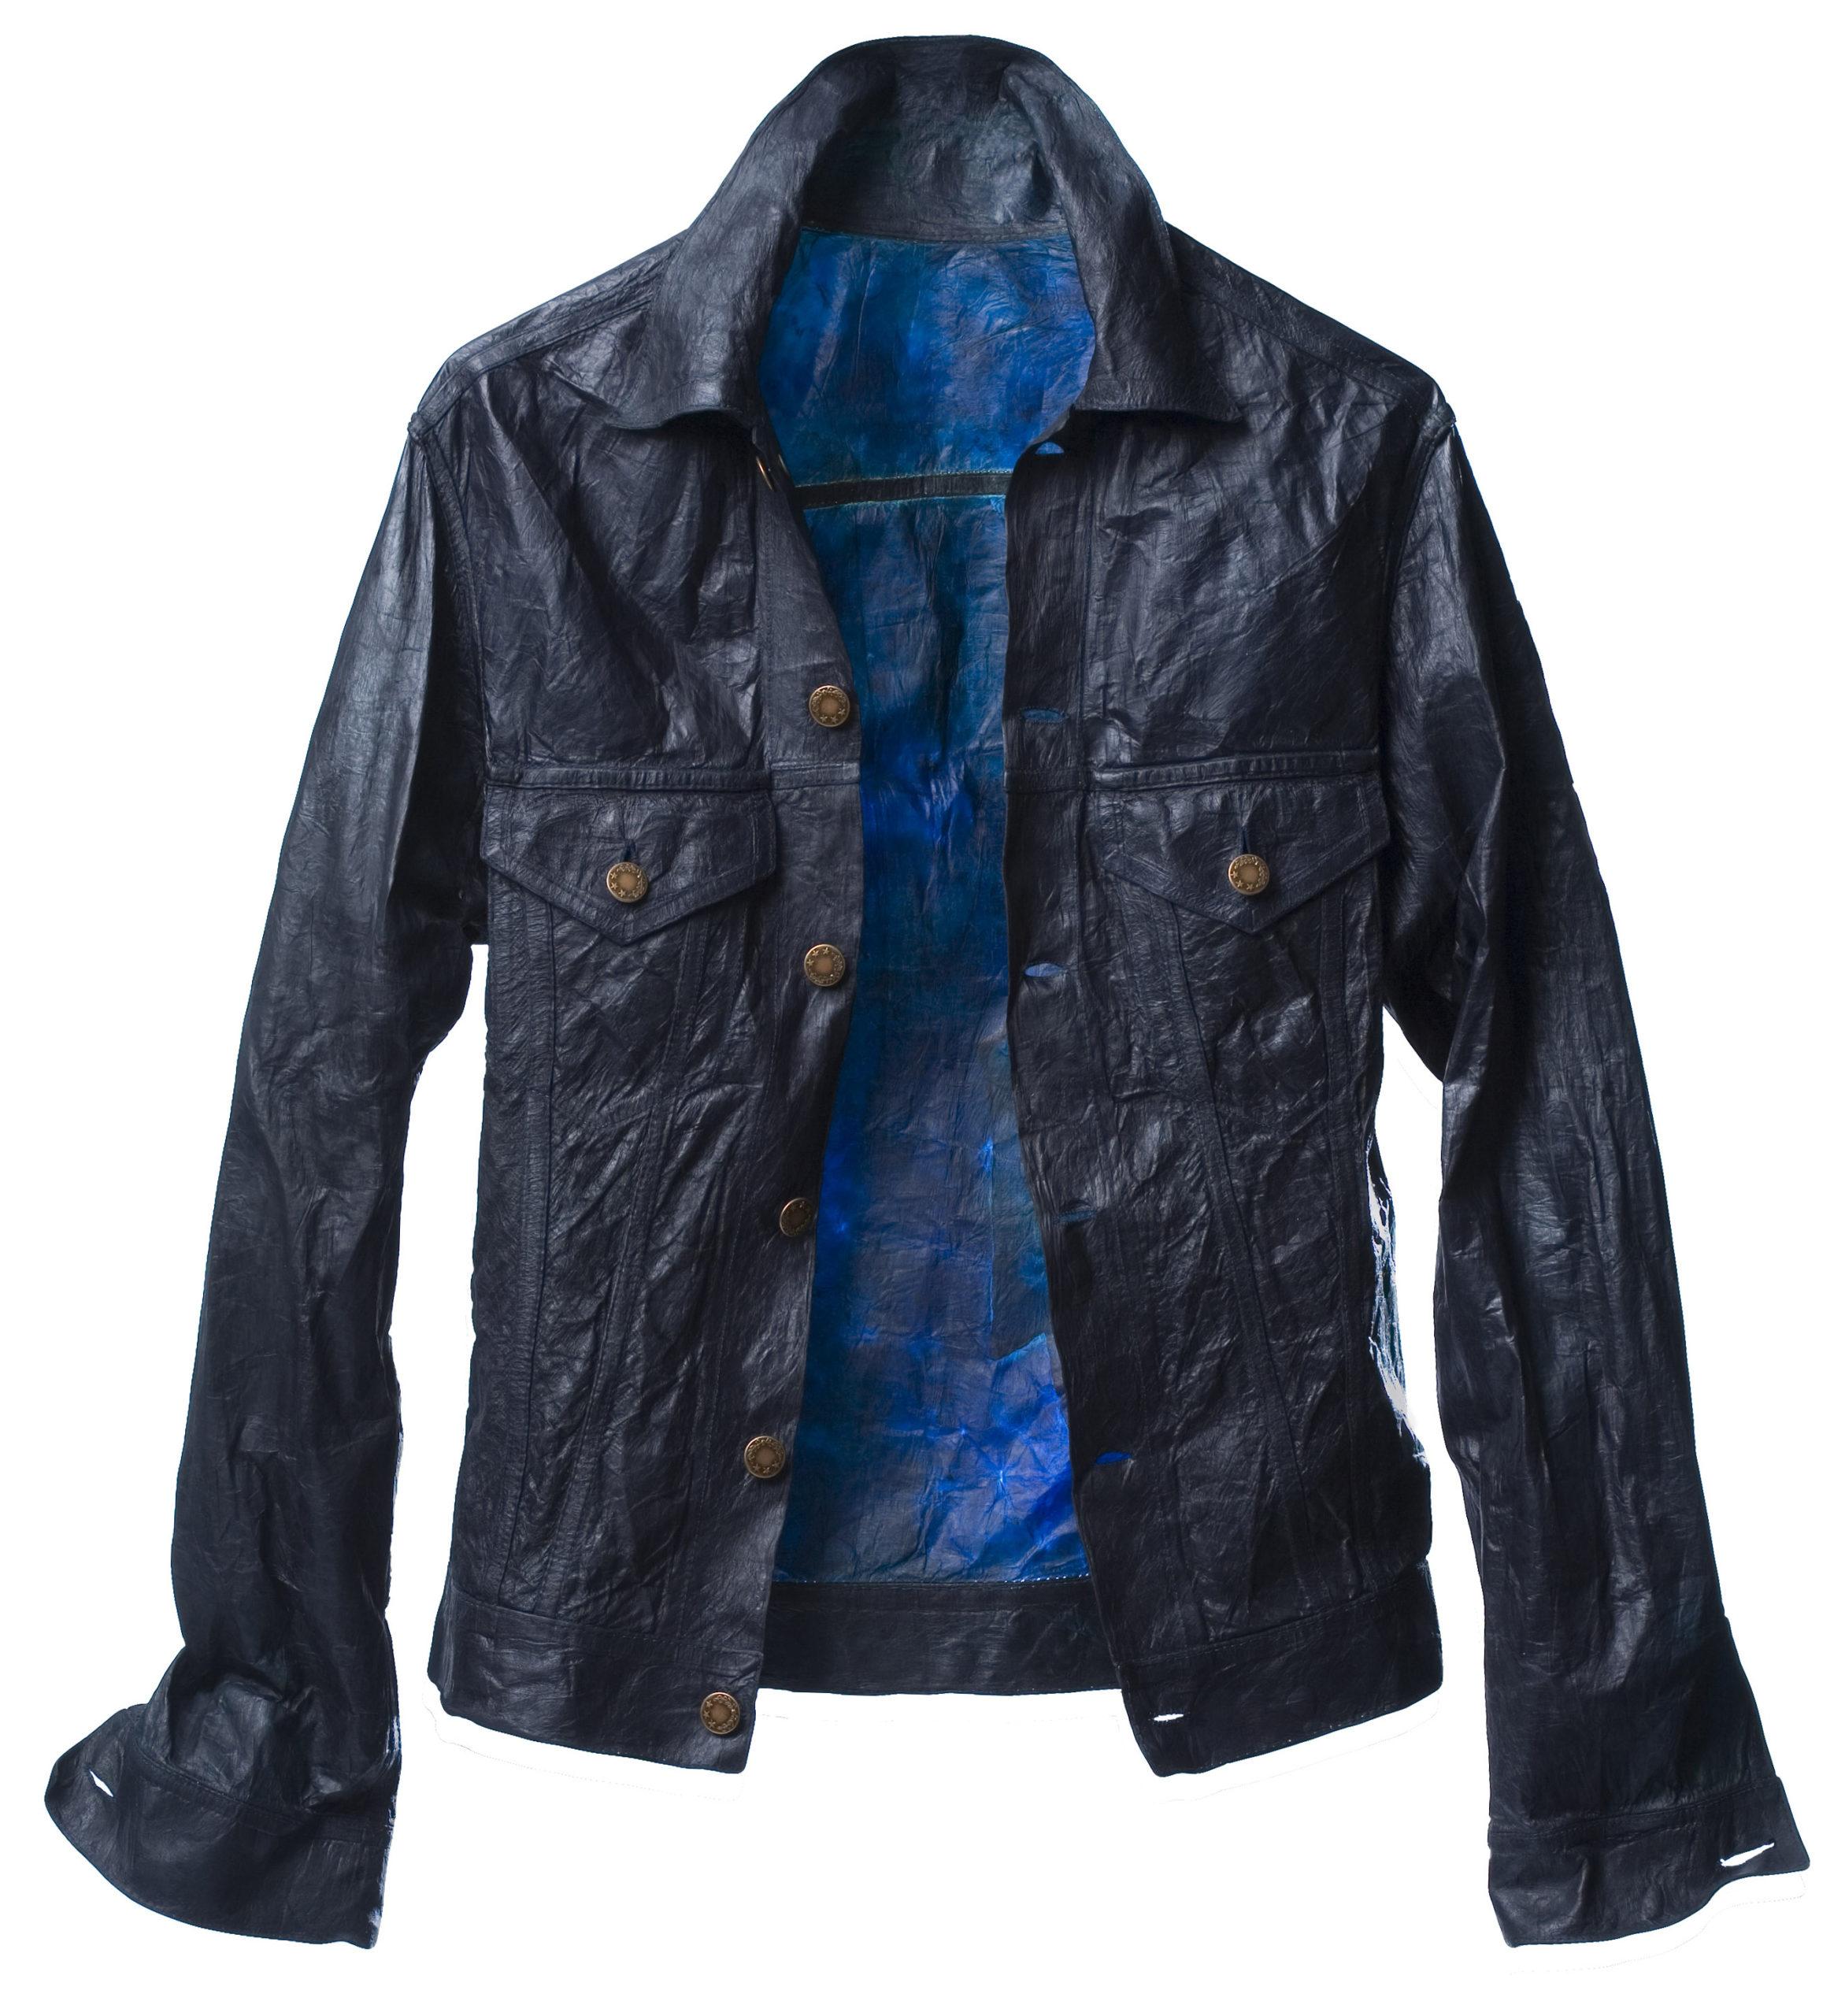 BiocoutureTM Denim Jacket, 2006, ©Biofabricate